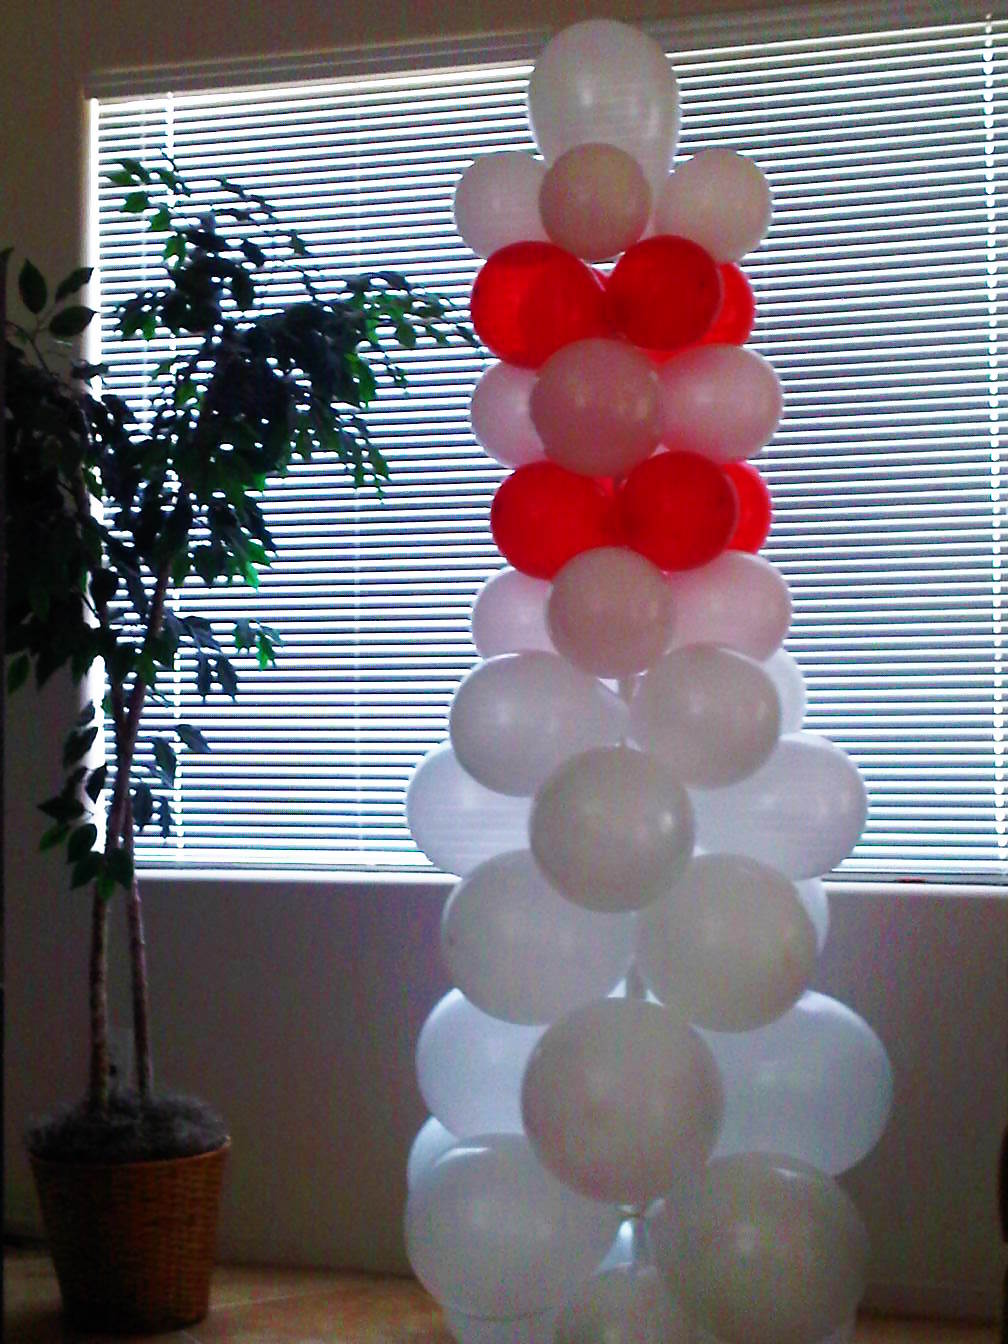 Bowling pin balloons - Bowling Pin Balloons 5